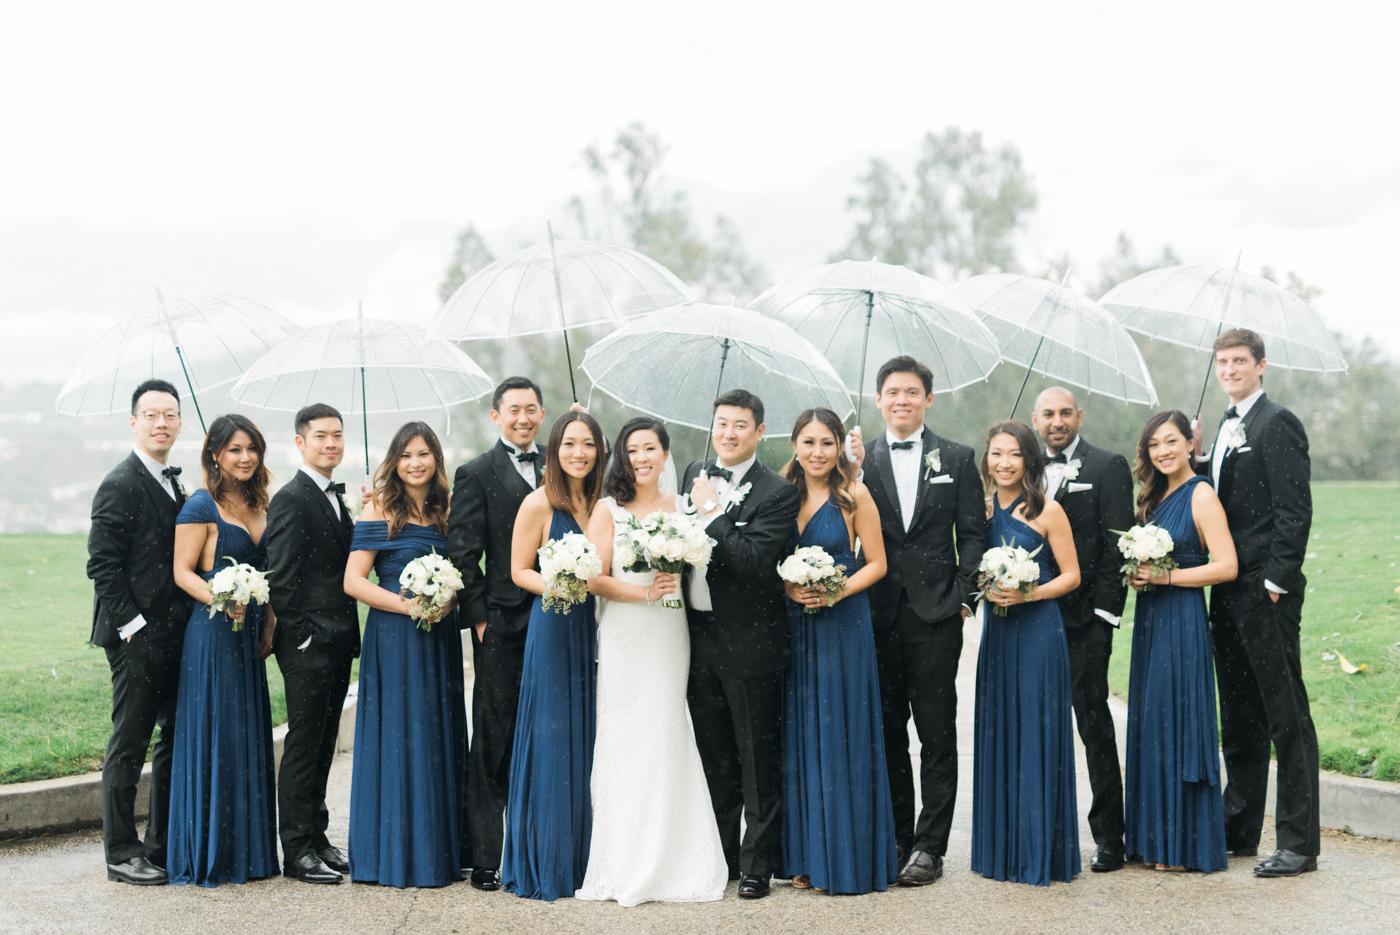 Friendly_Hills_Country_Club_fine_art_wedding_photographer_los_angeles_paris-12.jpg